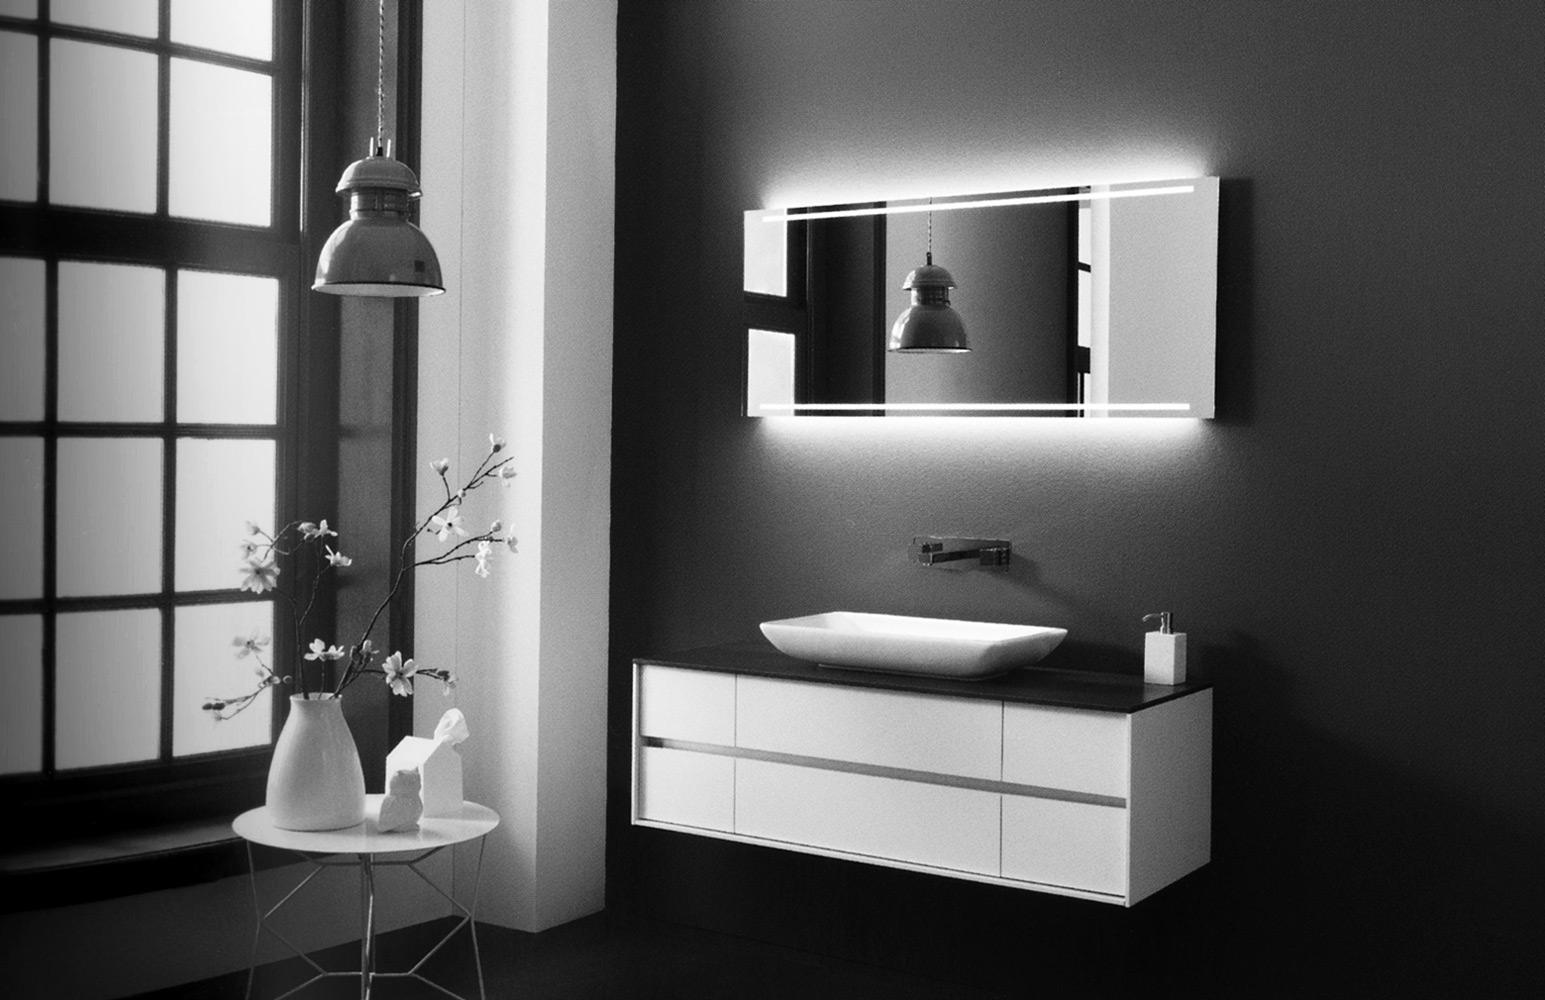 Design thebalux kategorie thebalux - Fliesen untergruppenbach ...